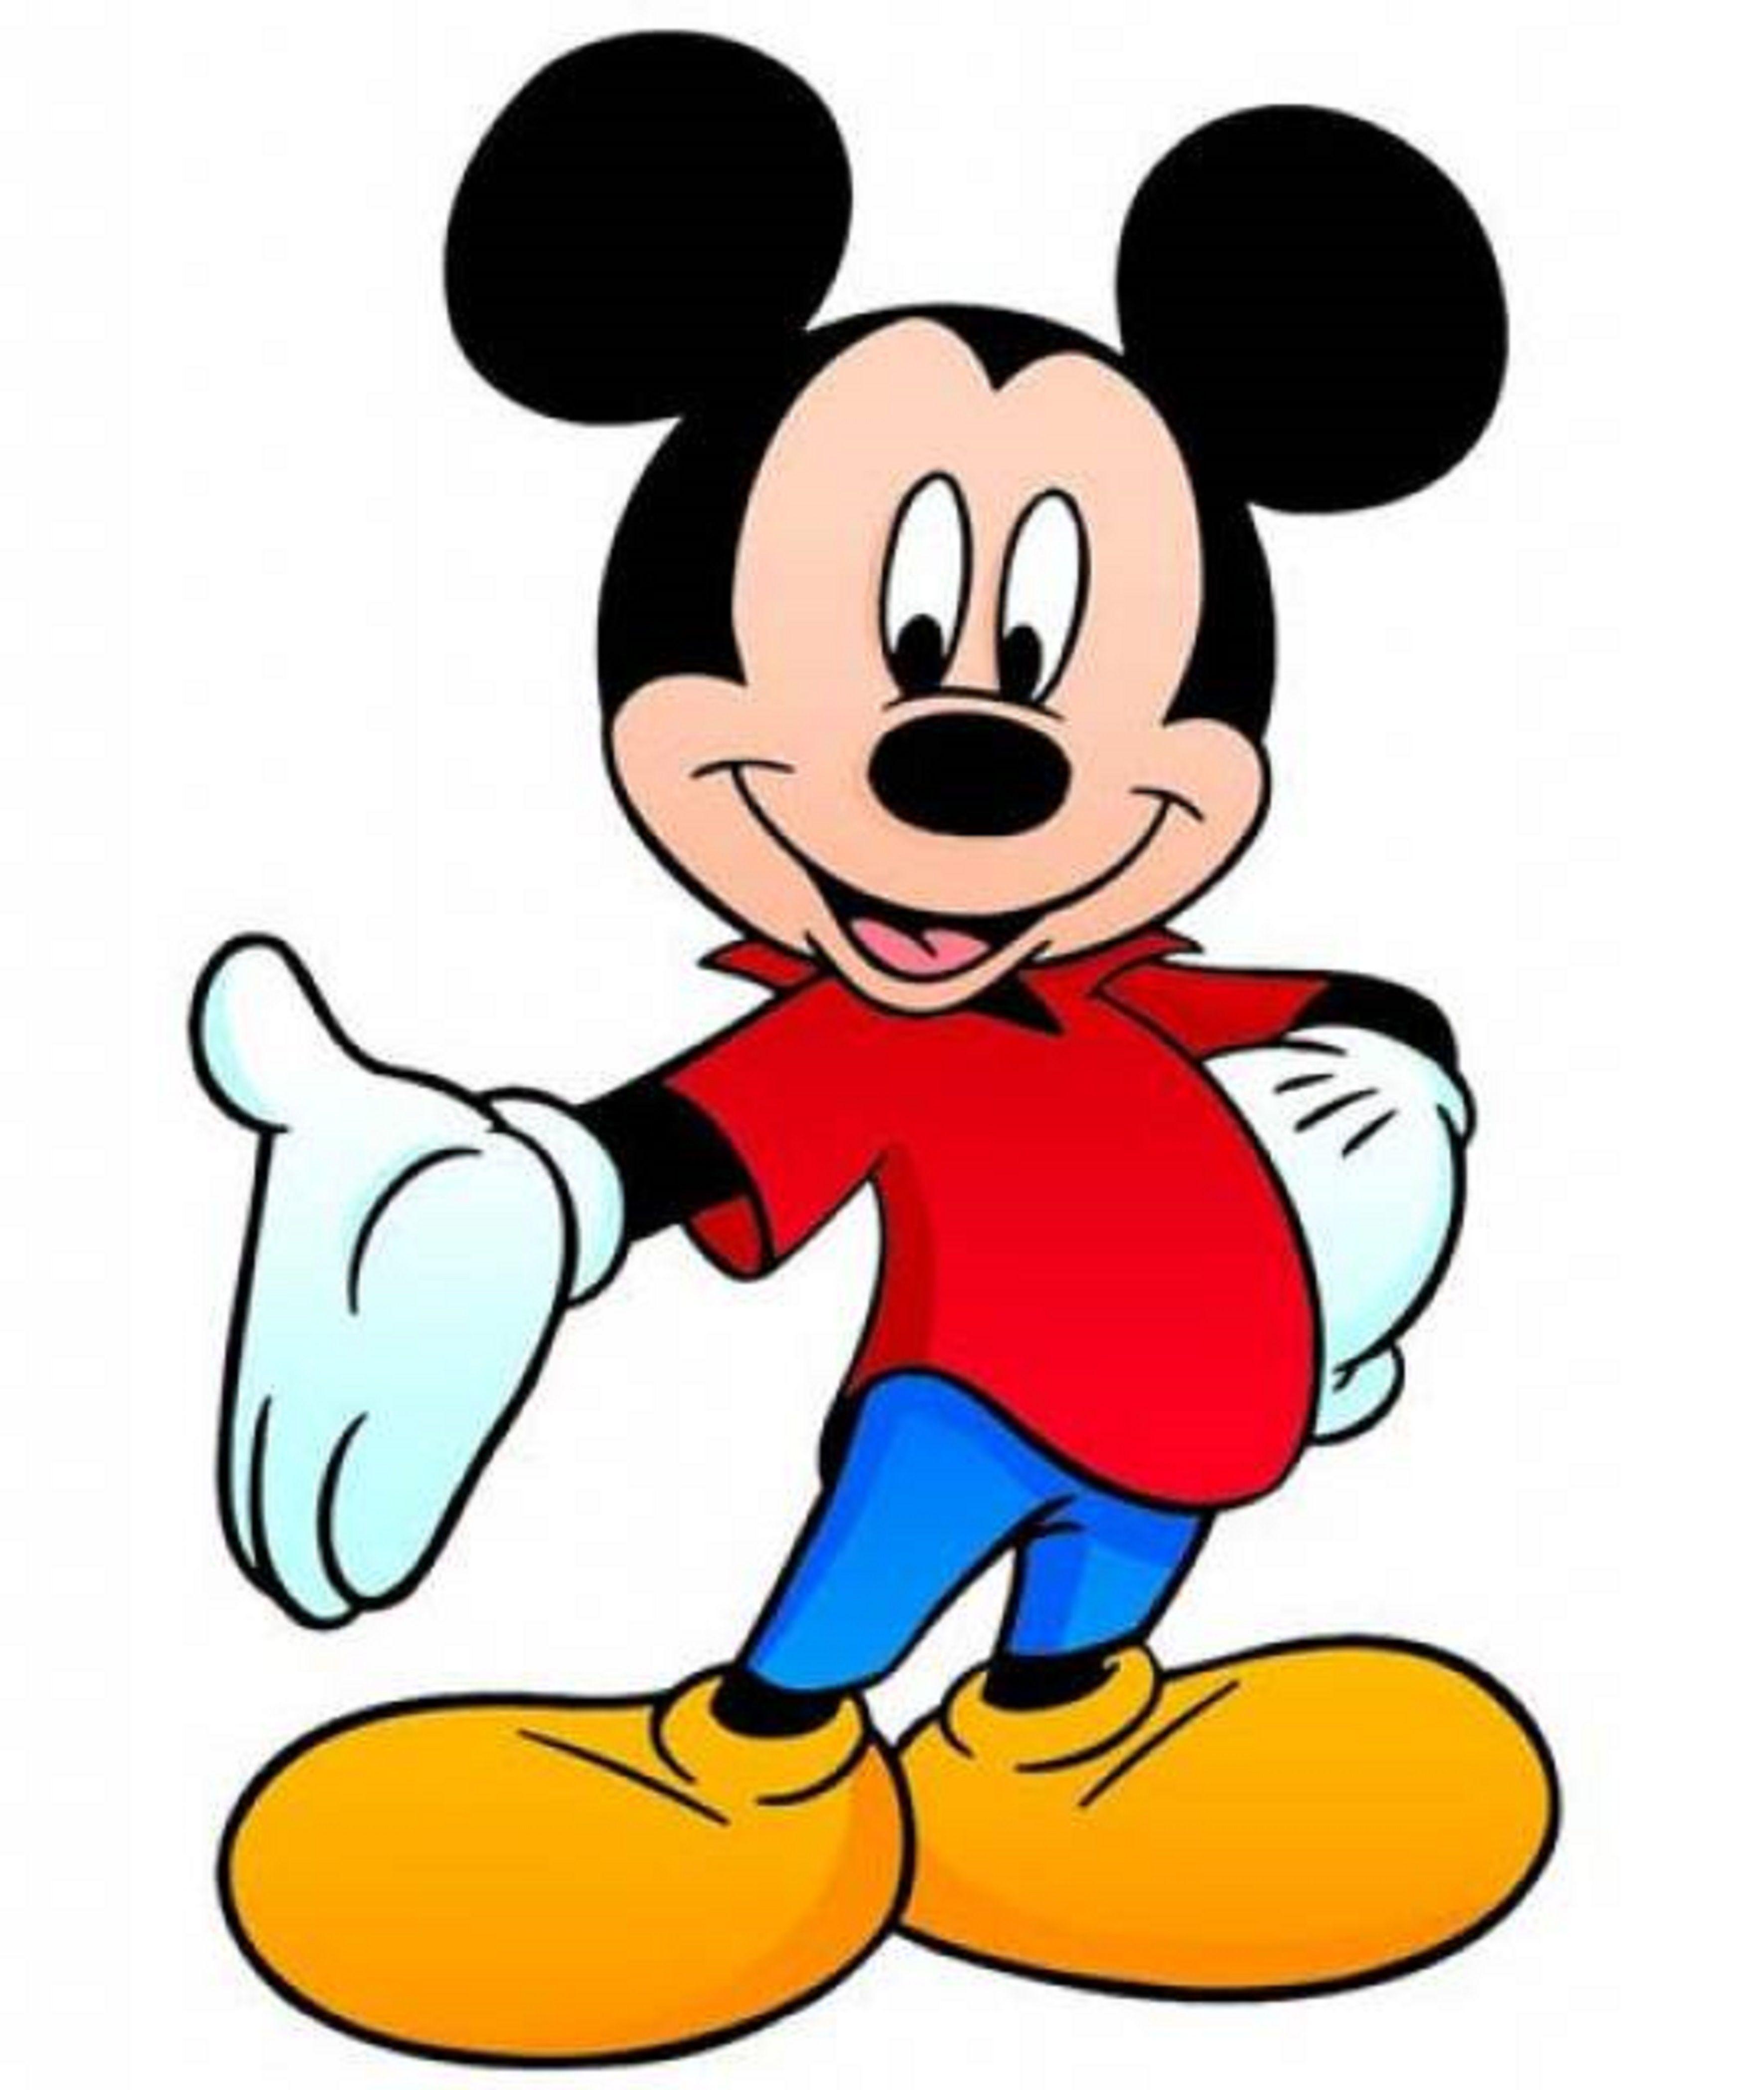 aaa03edcb507f ... Mickey Disney clip art I cannot list them all. Micky Mouse